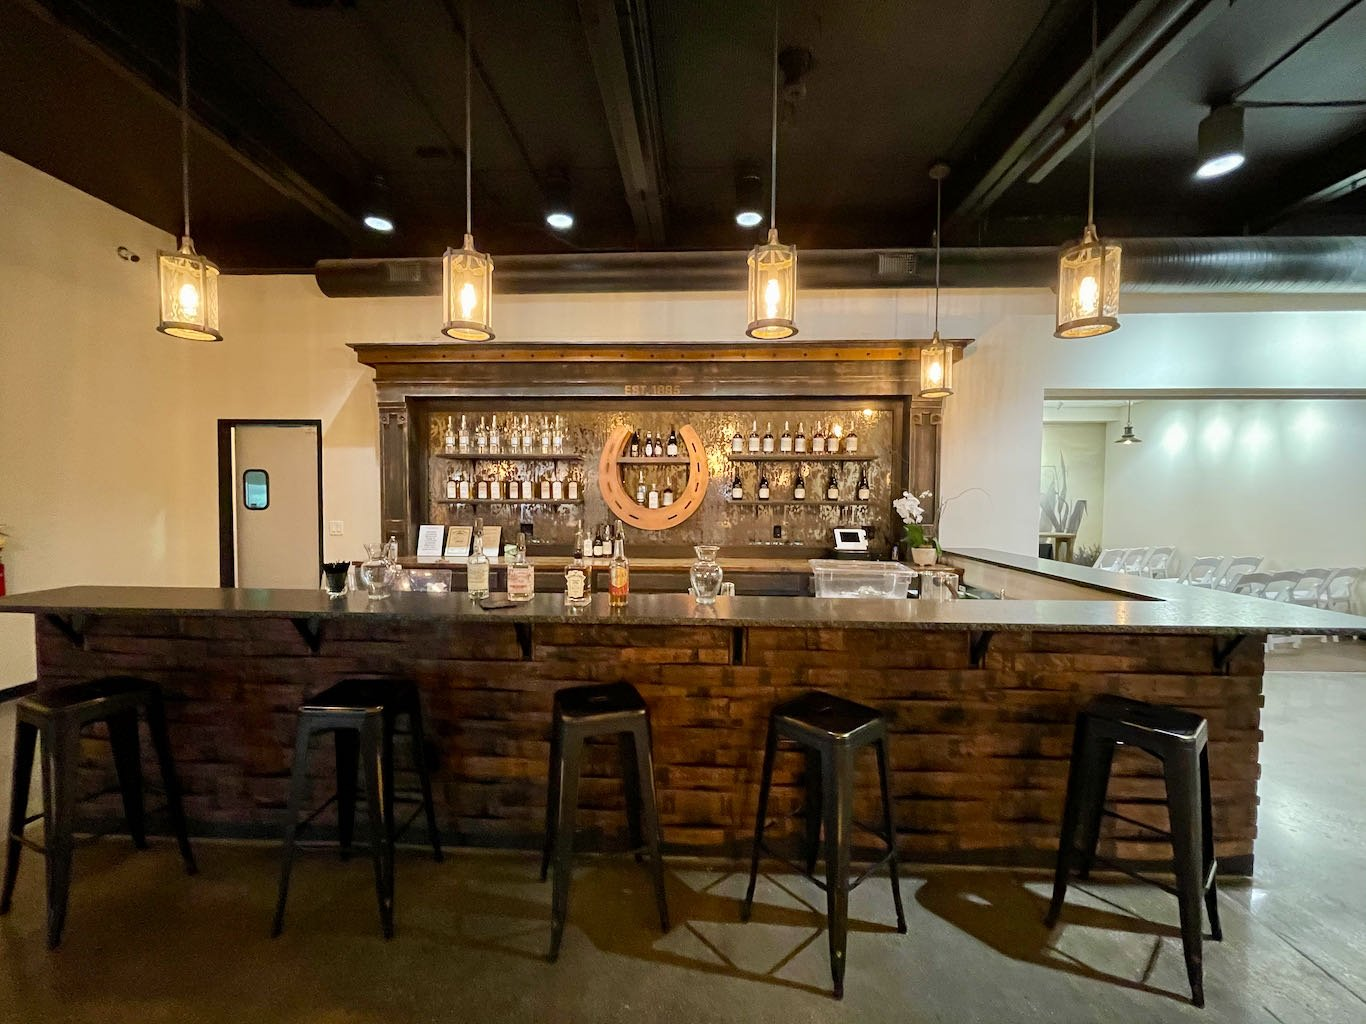 Cocktail Bar in Visitor Center - Green River Distilling Co